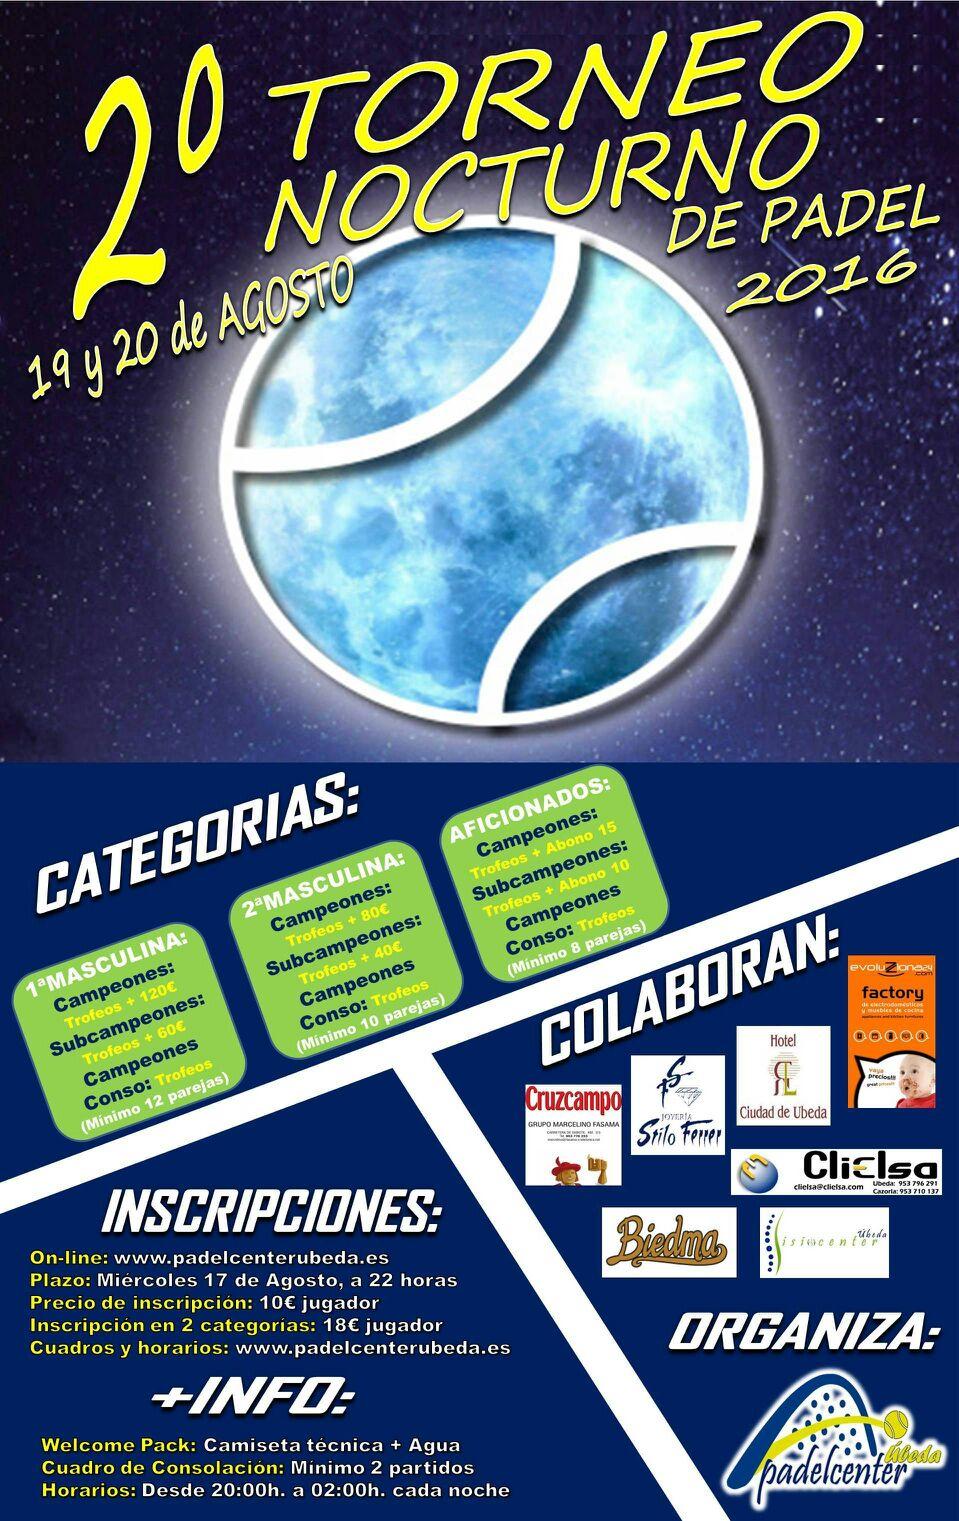 NocturnoAniversario_PadelCenterUbeda2016